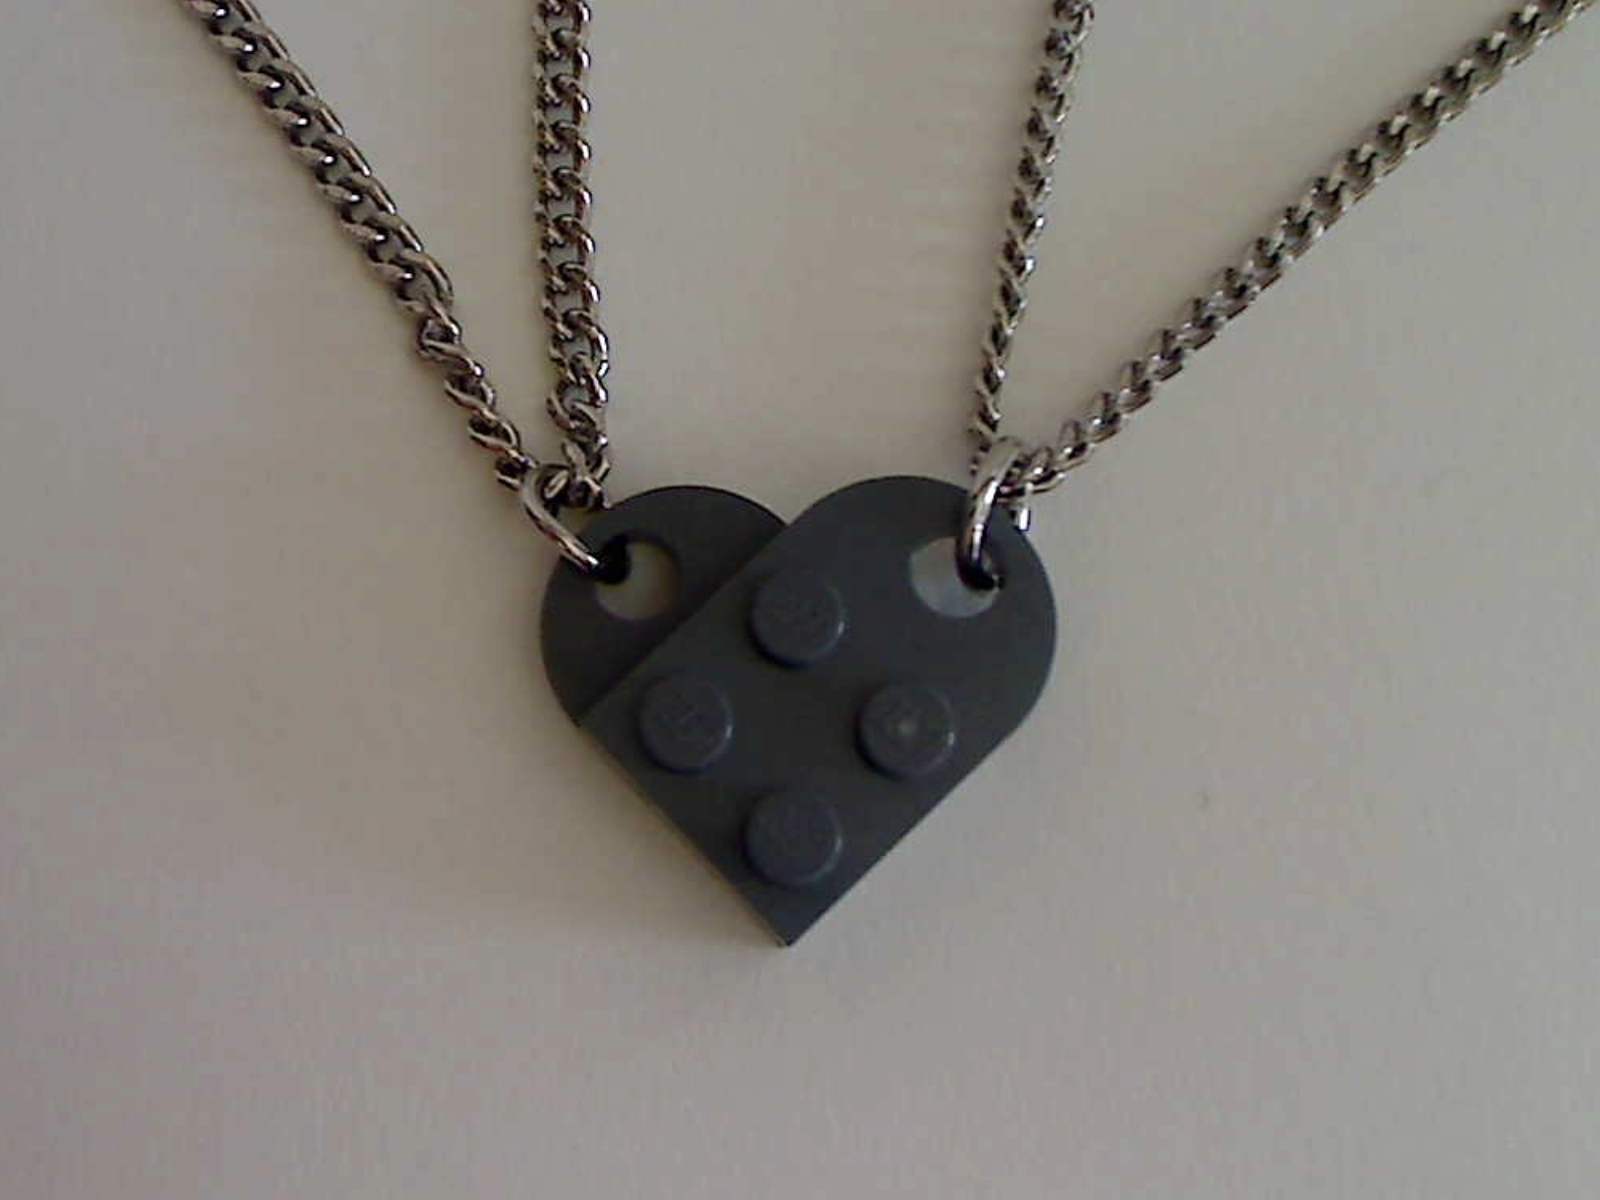 Lego Interlocking Heart Pendants